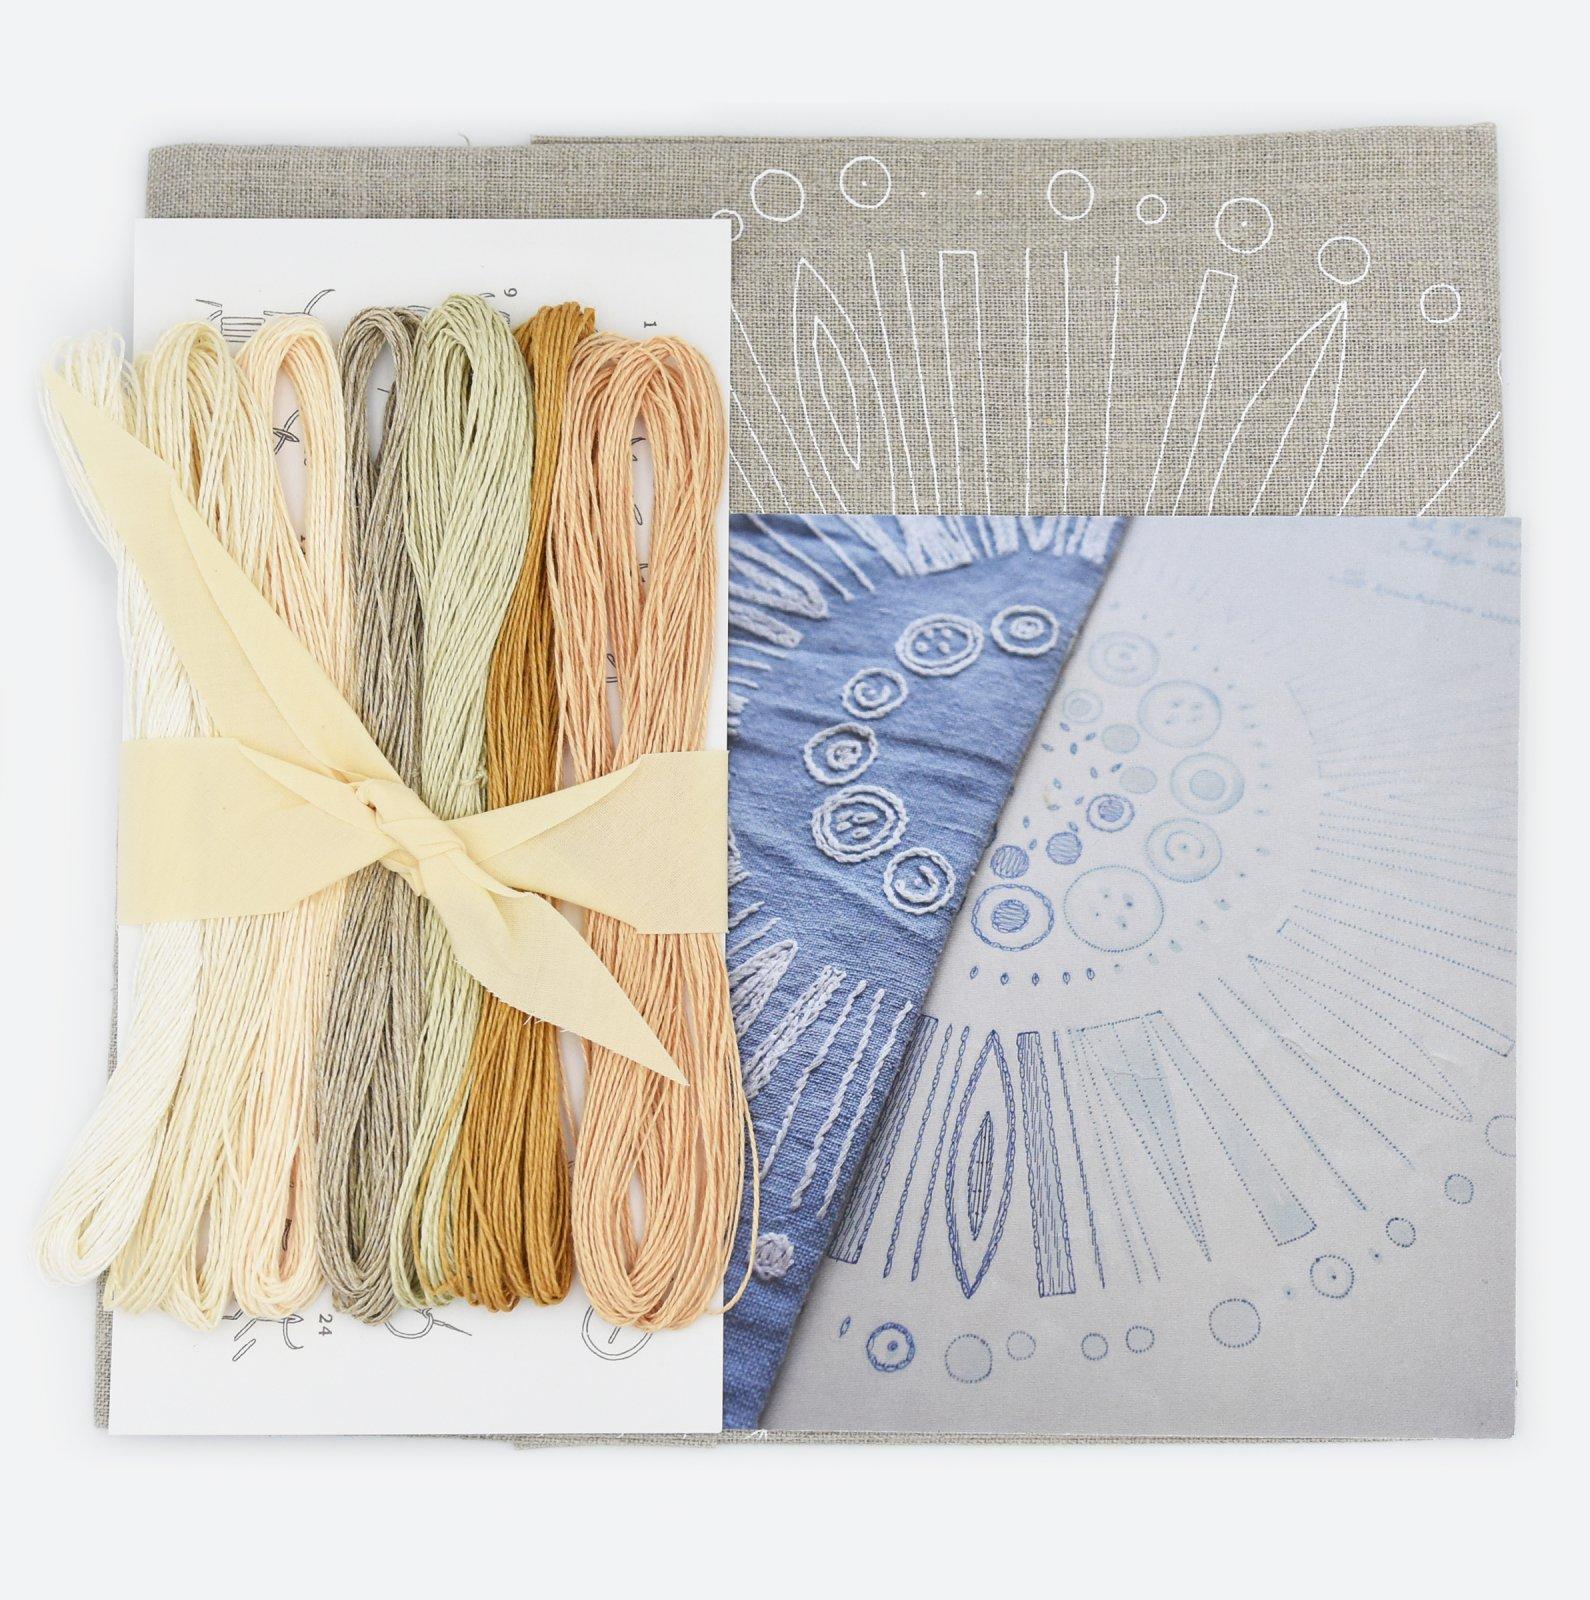 Linladan - Natural Linen Circle - Nordiska print with linen threads